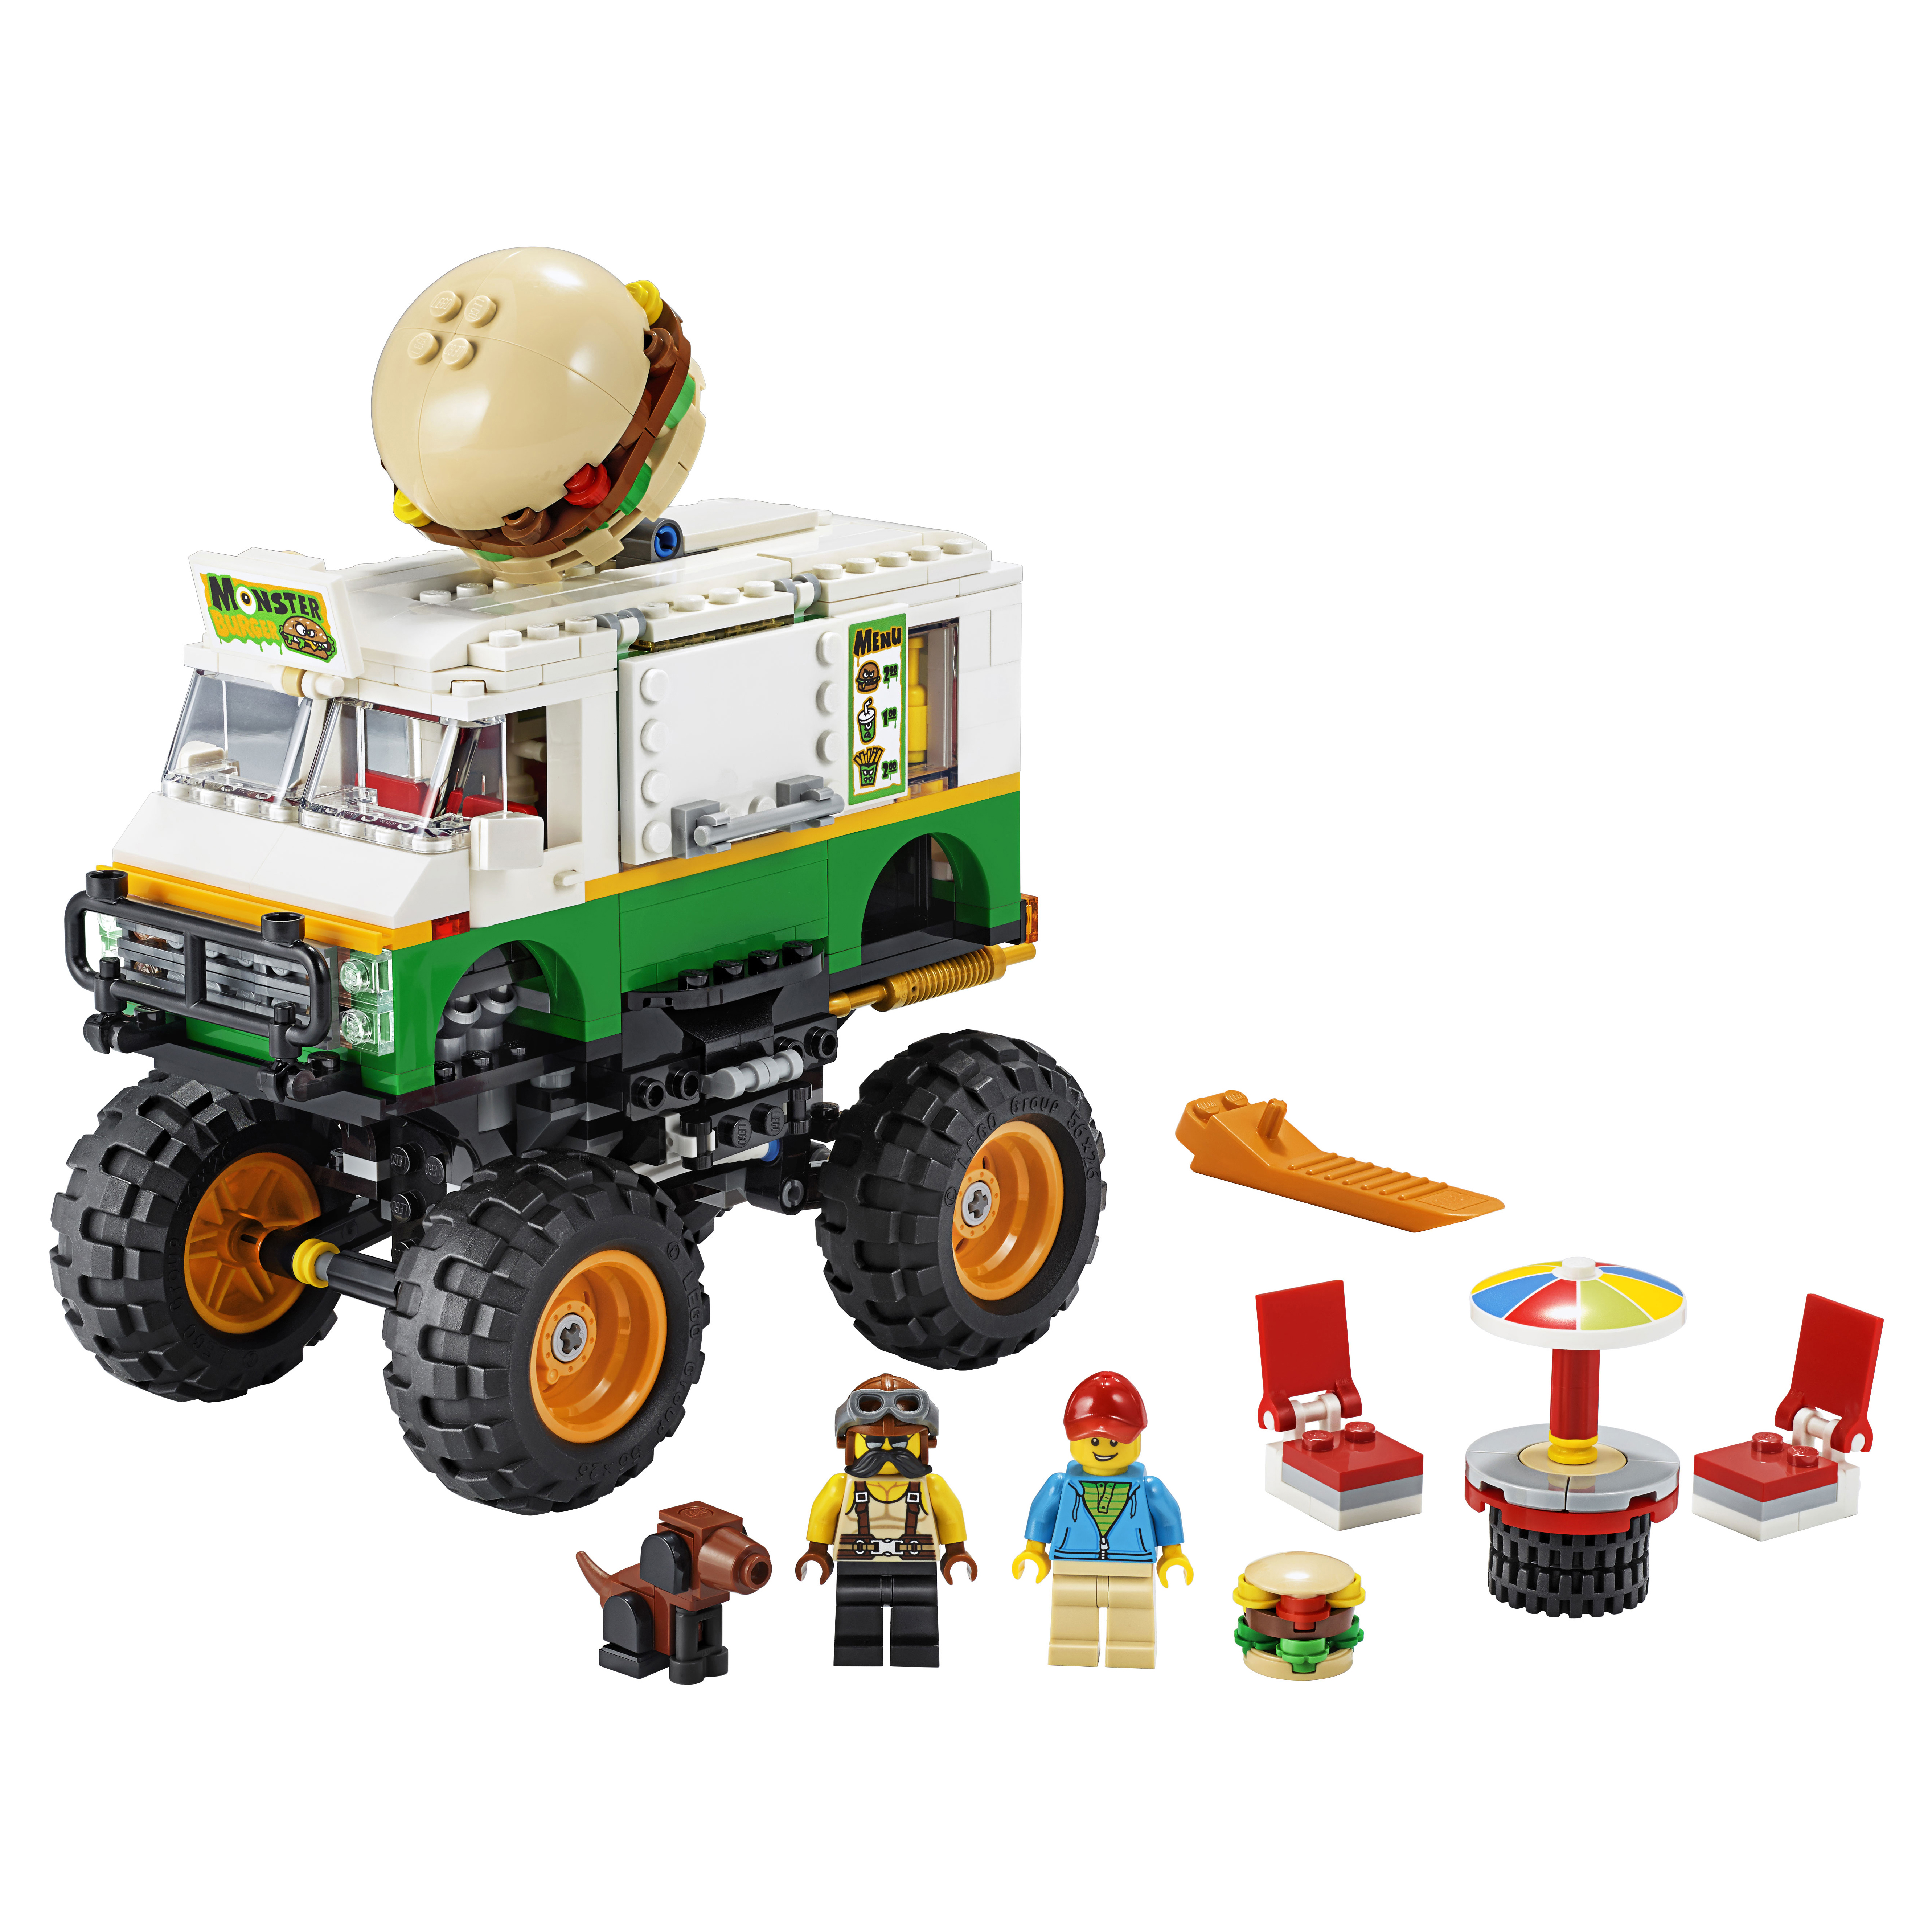 Конструктор LEGO Creator 31104 Грузовик «Монстрбургер»